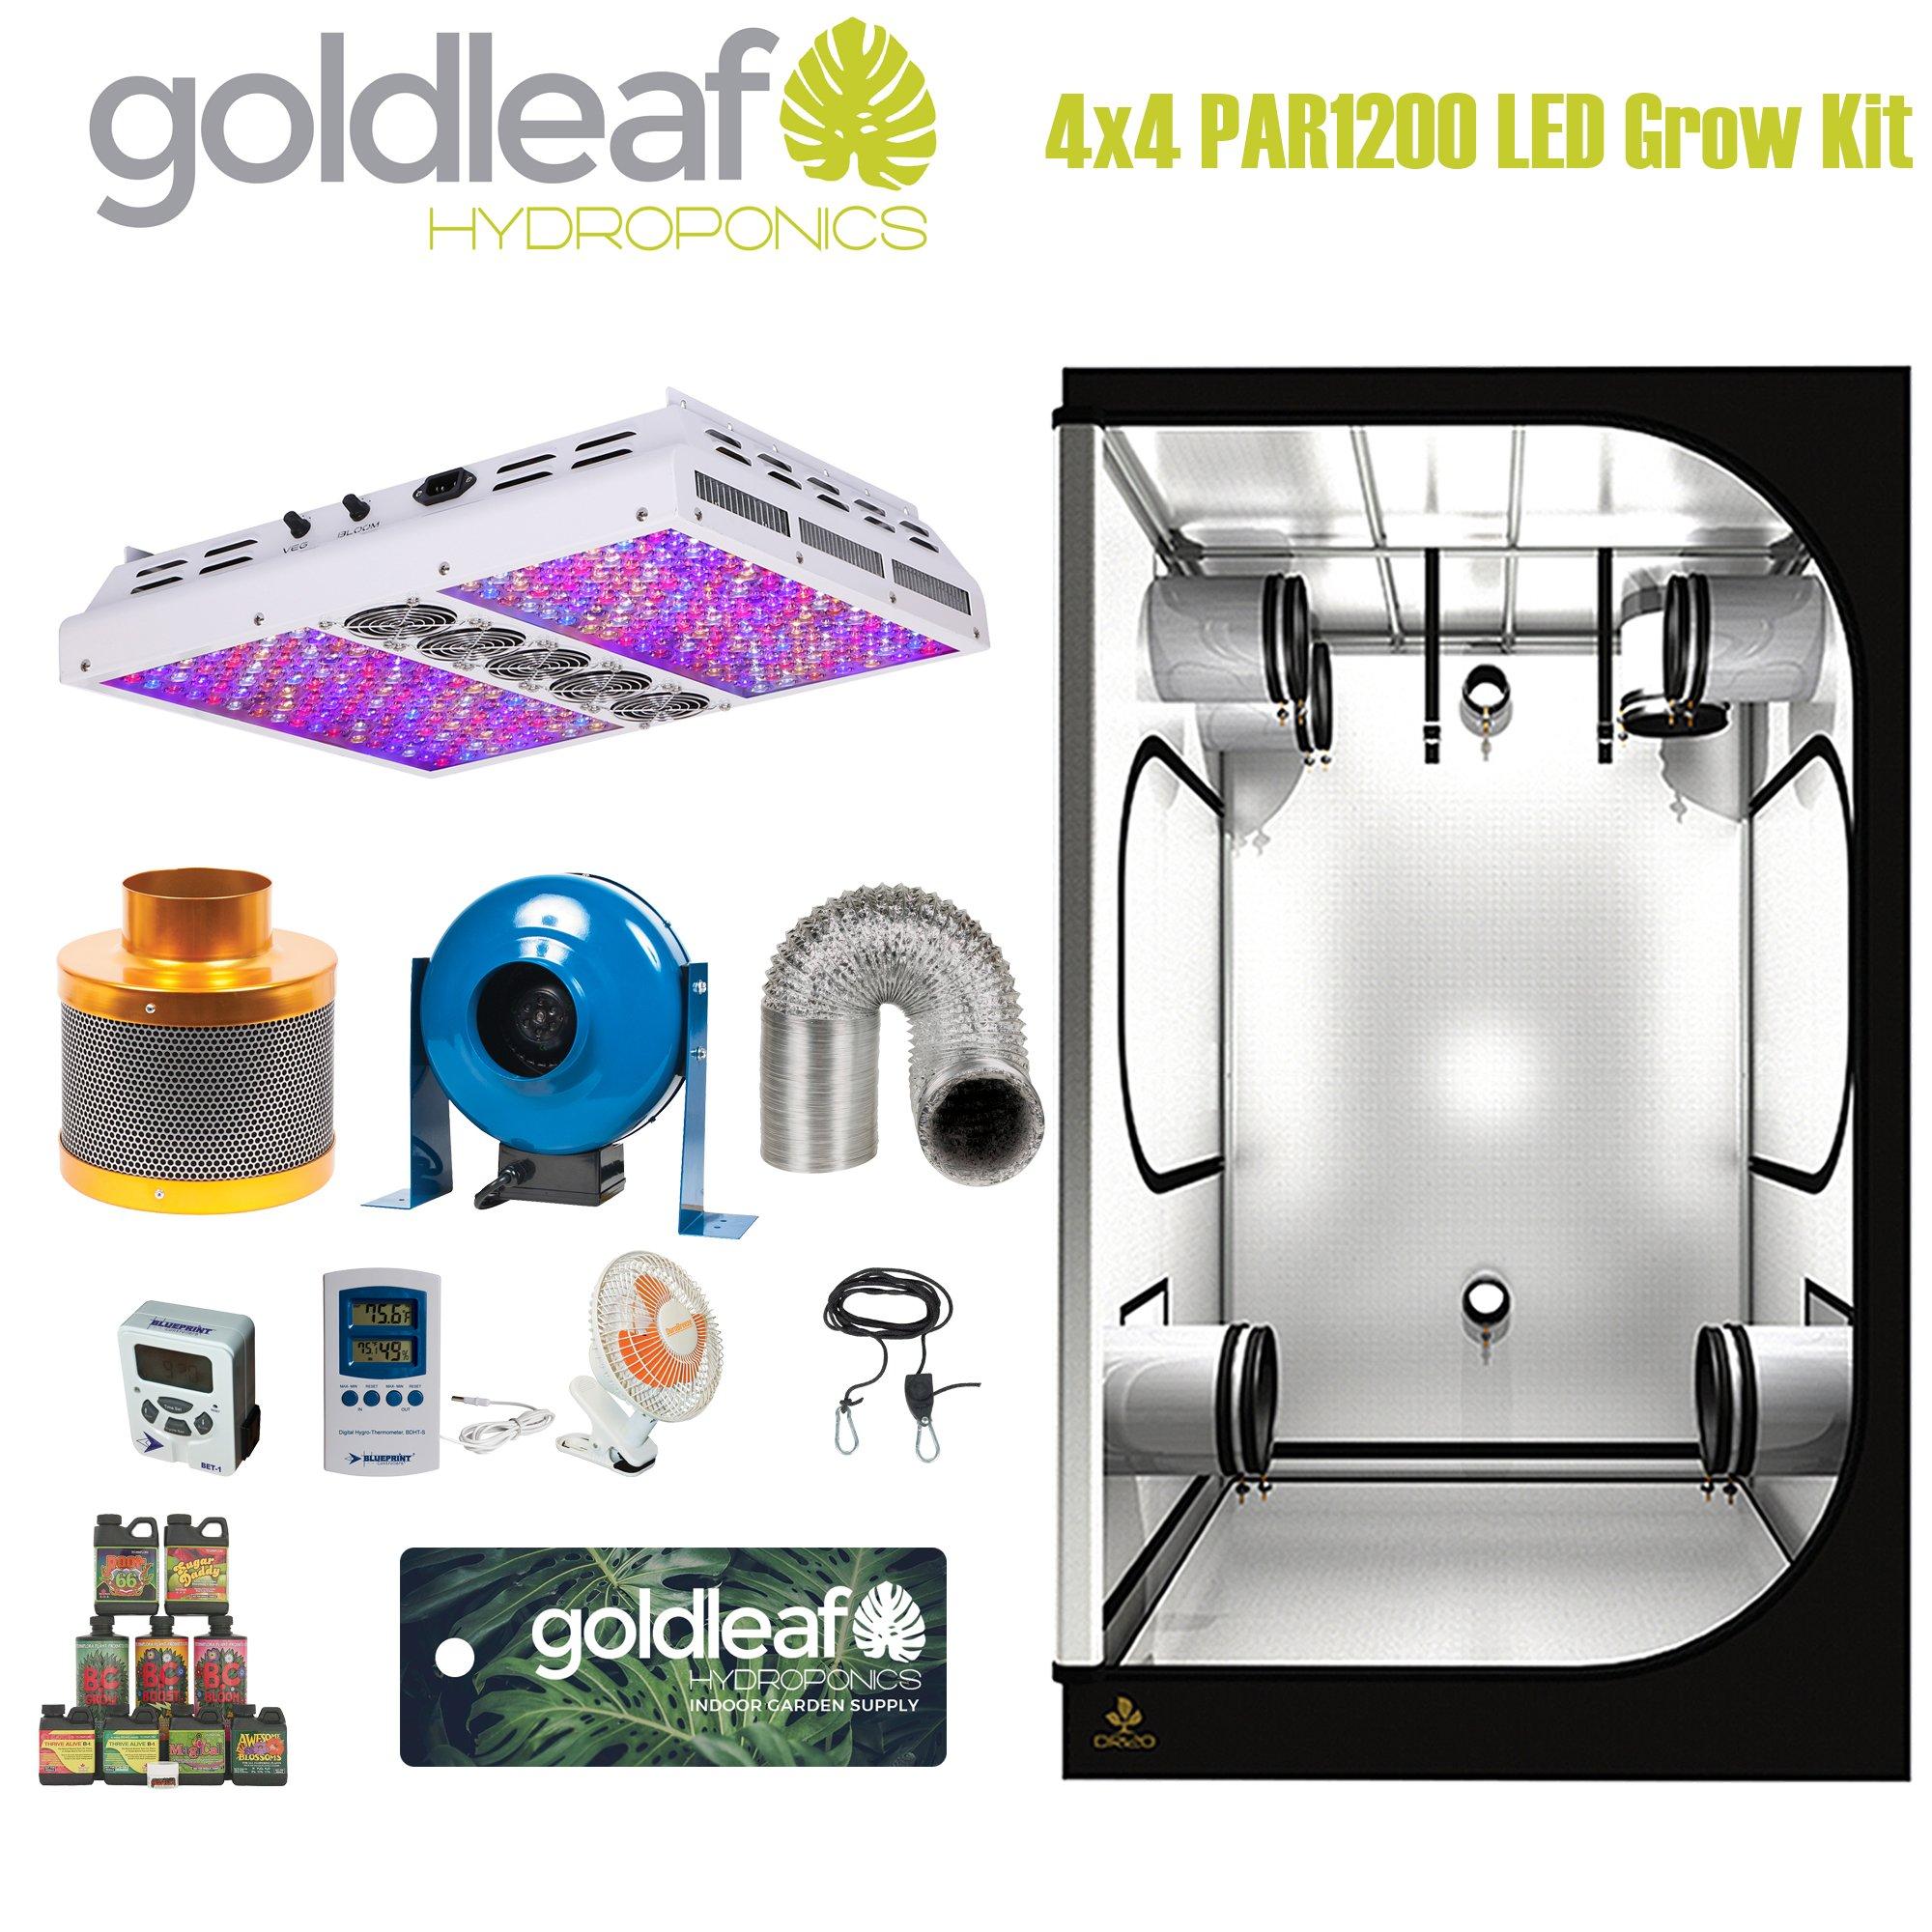 Complete 4 x 4 Grow Tent Kit w/ PAR1200 LED light, fan, carbon filter and more